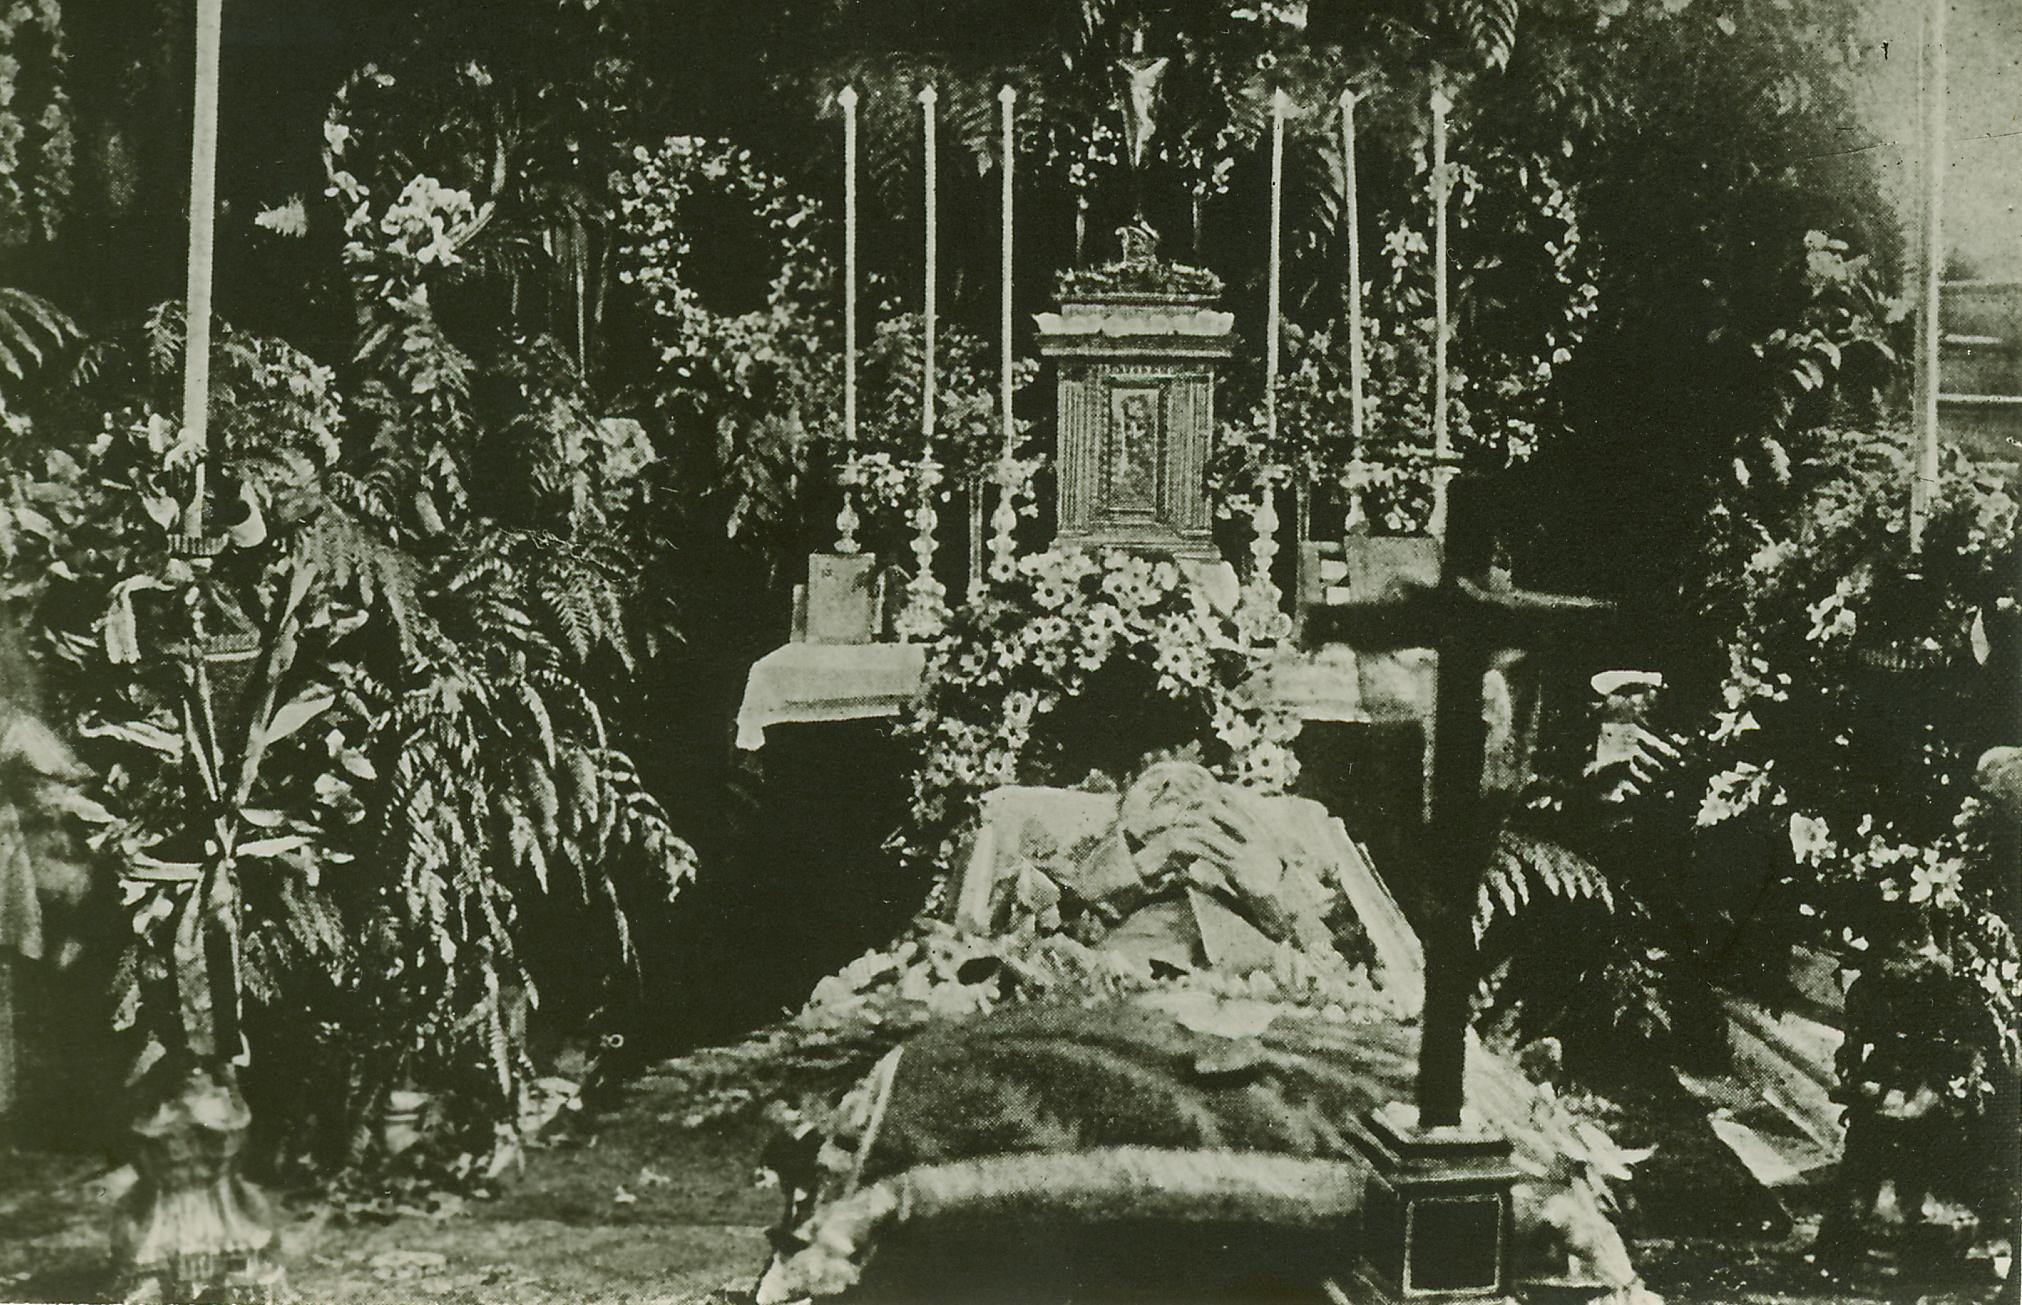 Emperor Karl Lies in Repose Before the Requiem Mass